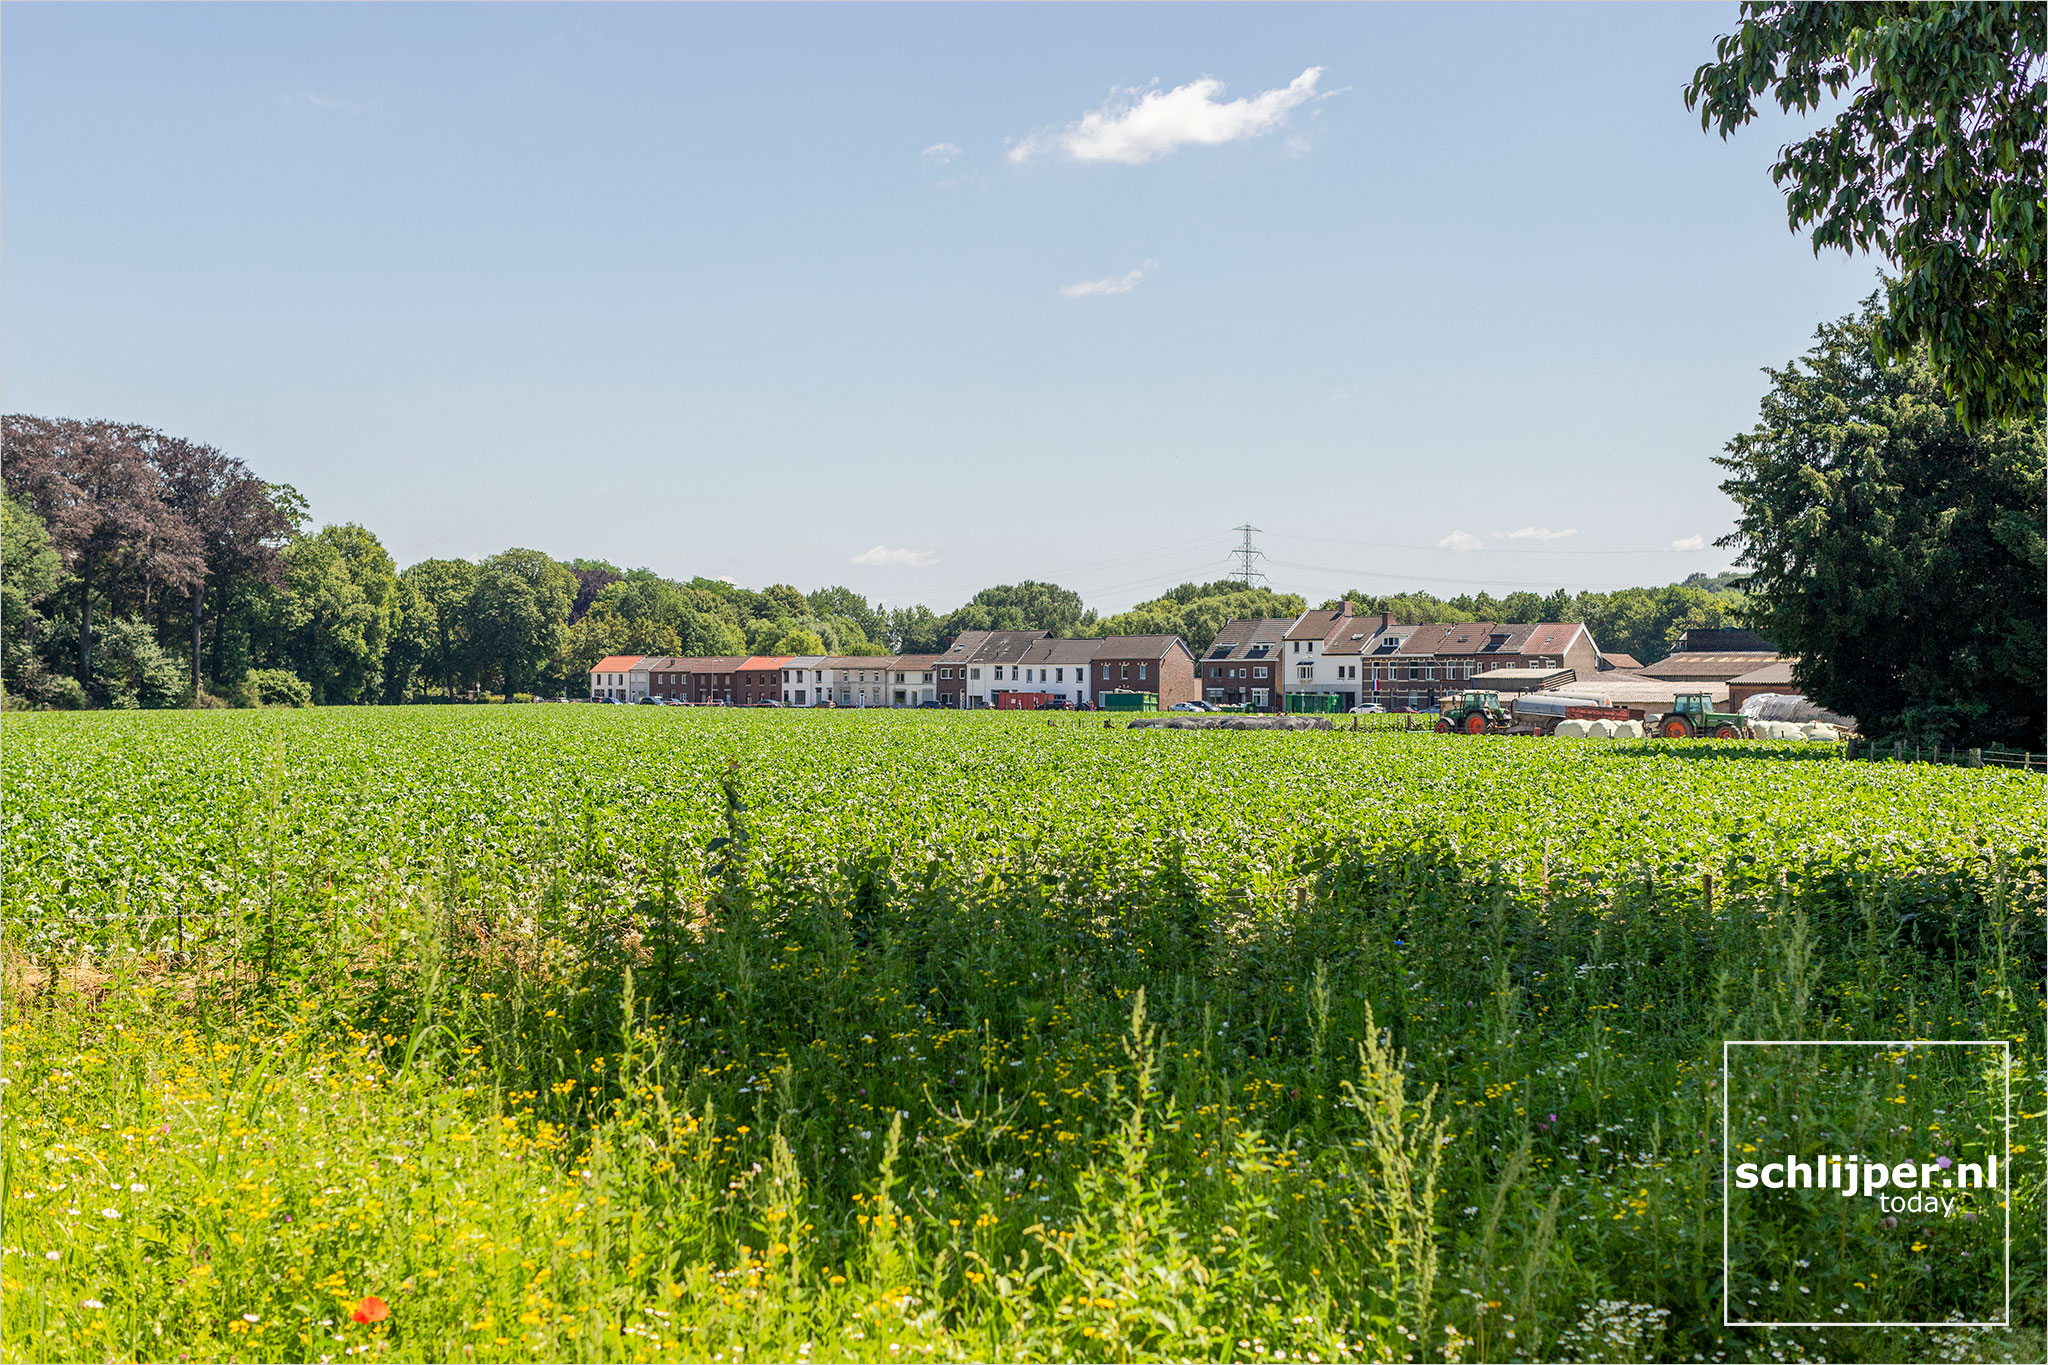 The Netherlands, Rothem, 19 juli 2021